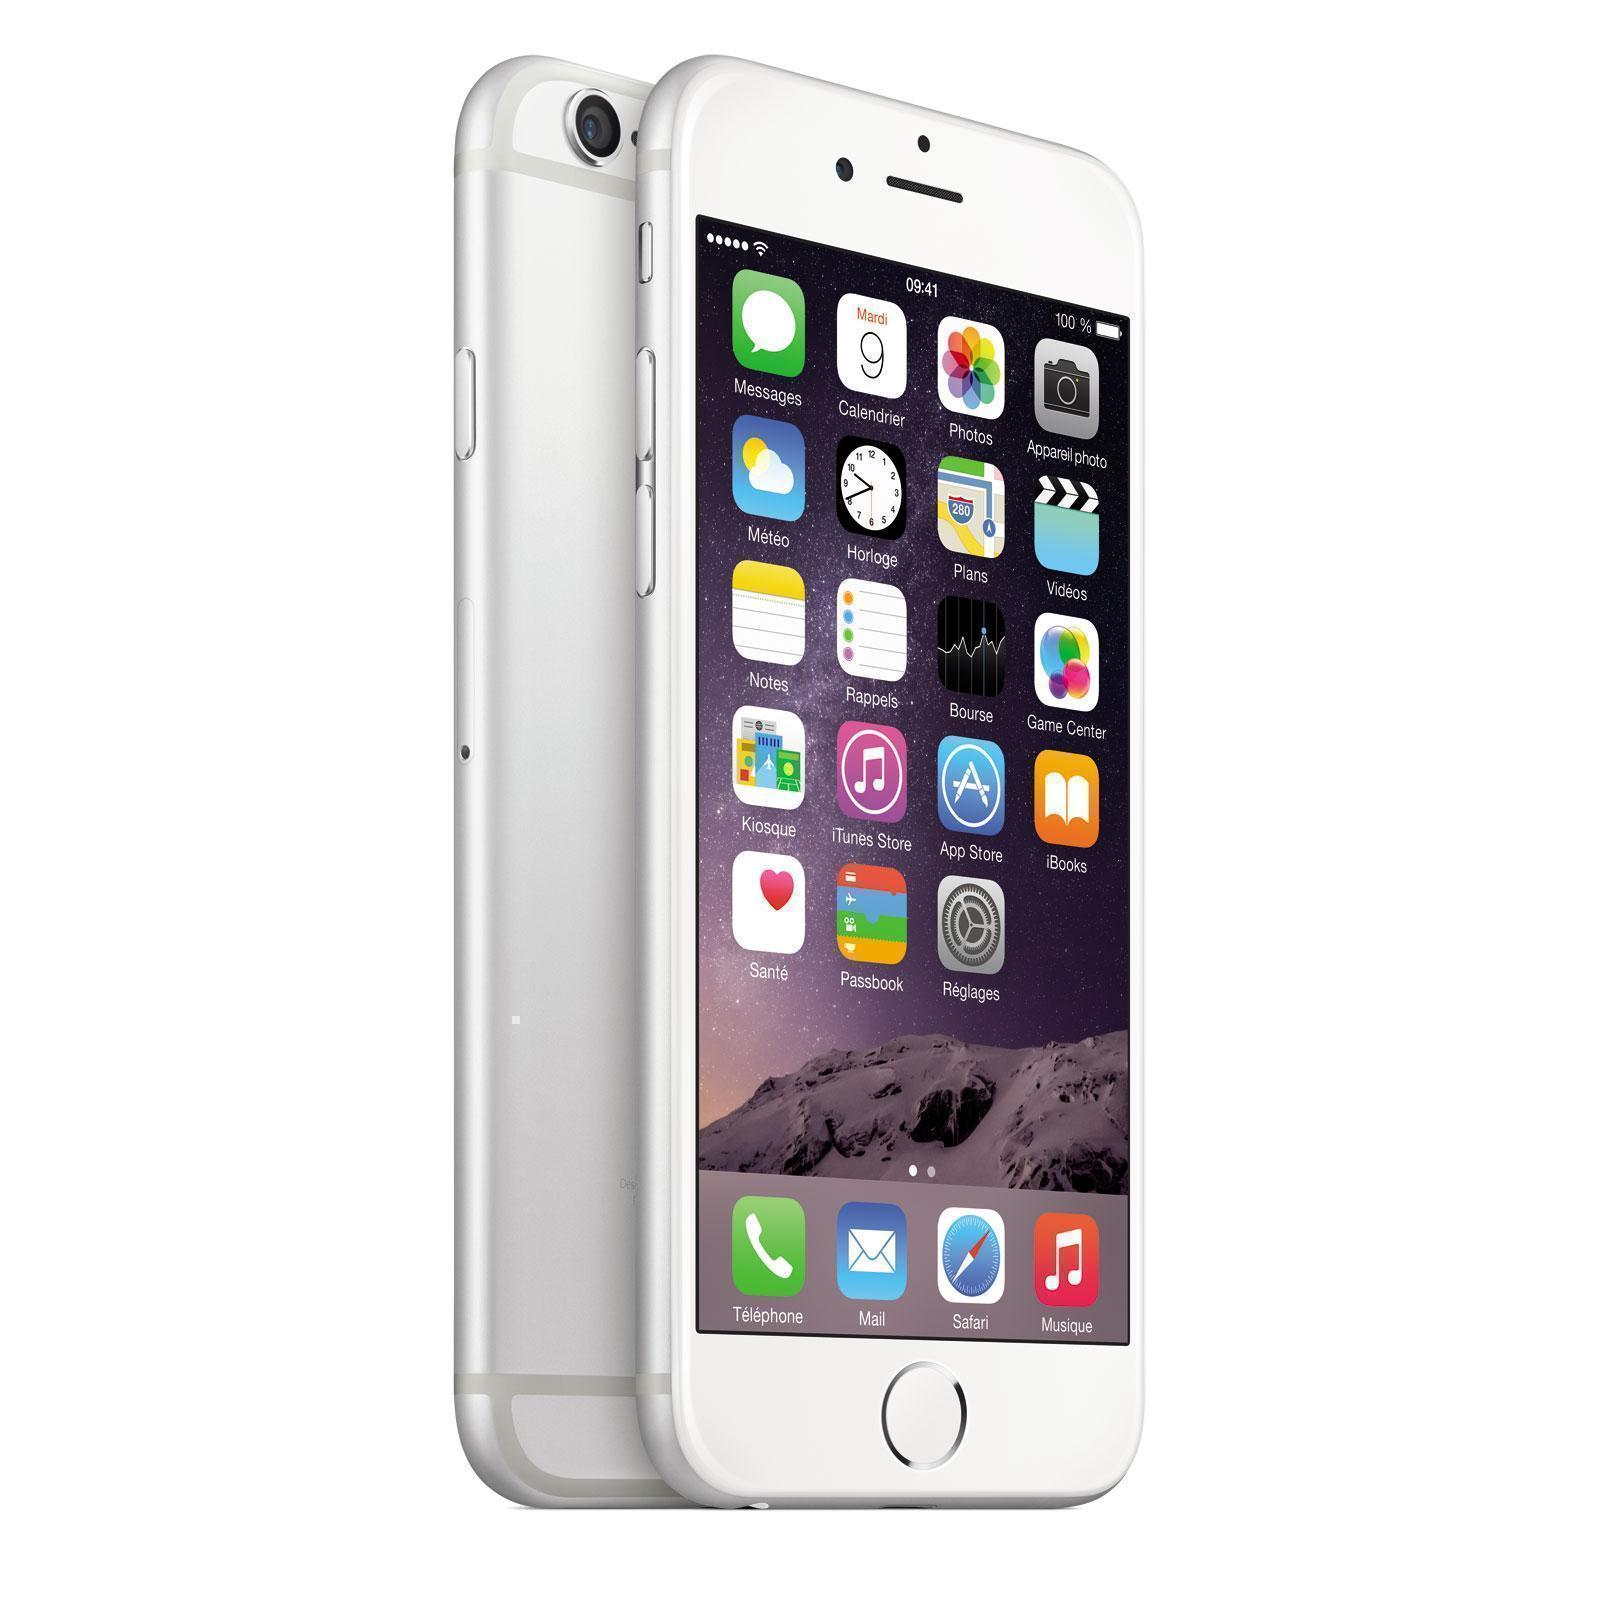 iPhone 6 Plus 64GB - Silber - Ohne Vertrag